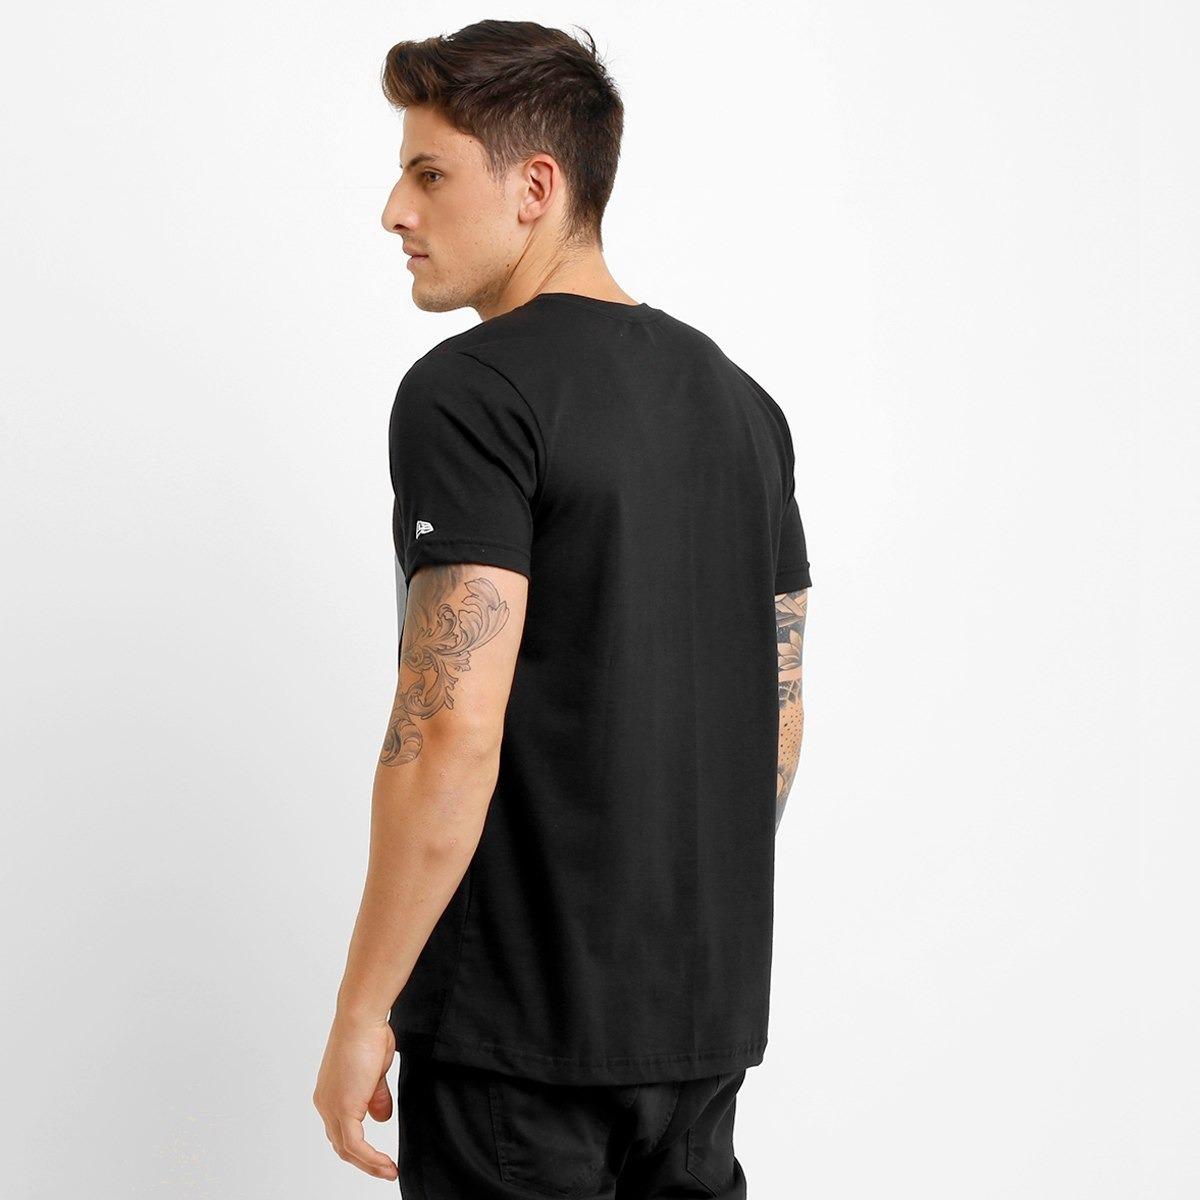 83393bc64f5f3 camiseta new era nfl permanente pittsburgh steelers - preto. Carregando  zoom.